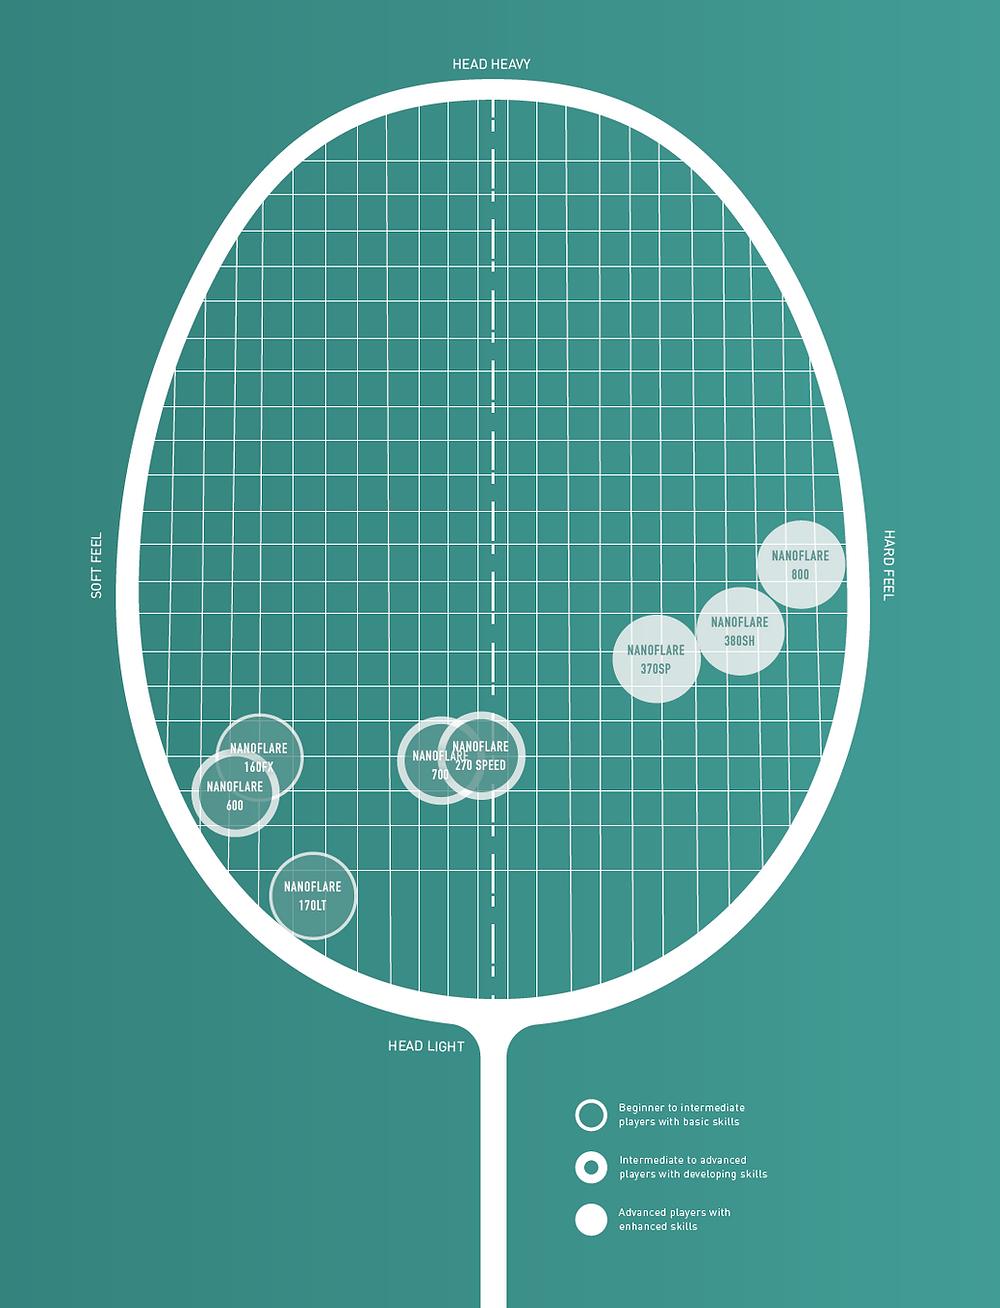 Yonex head light racket series - Nanoflare